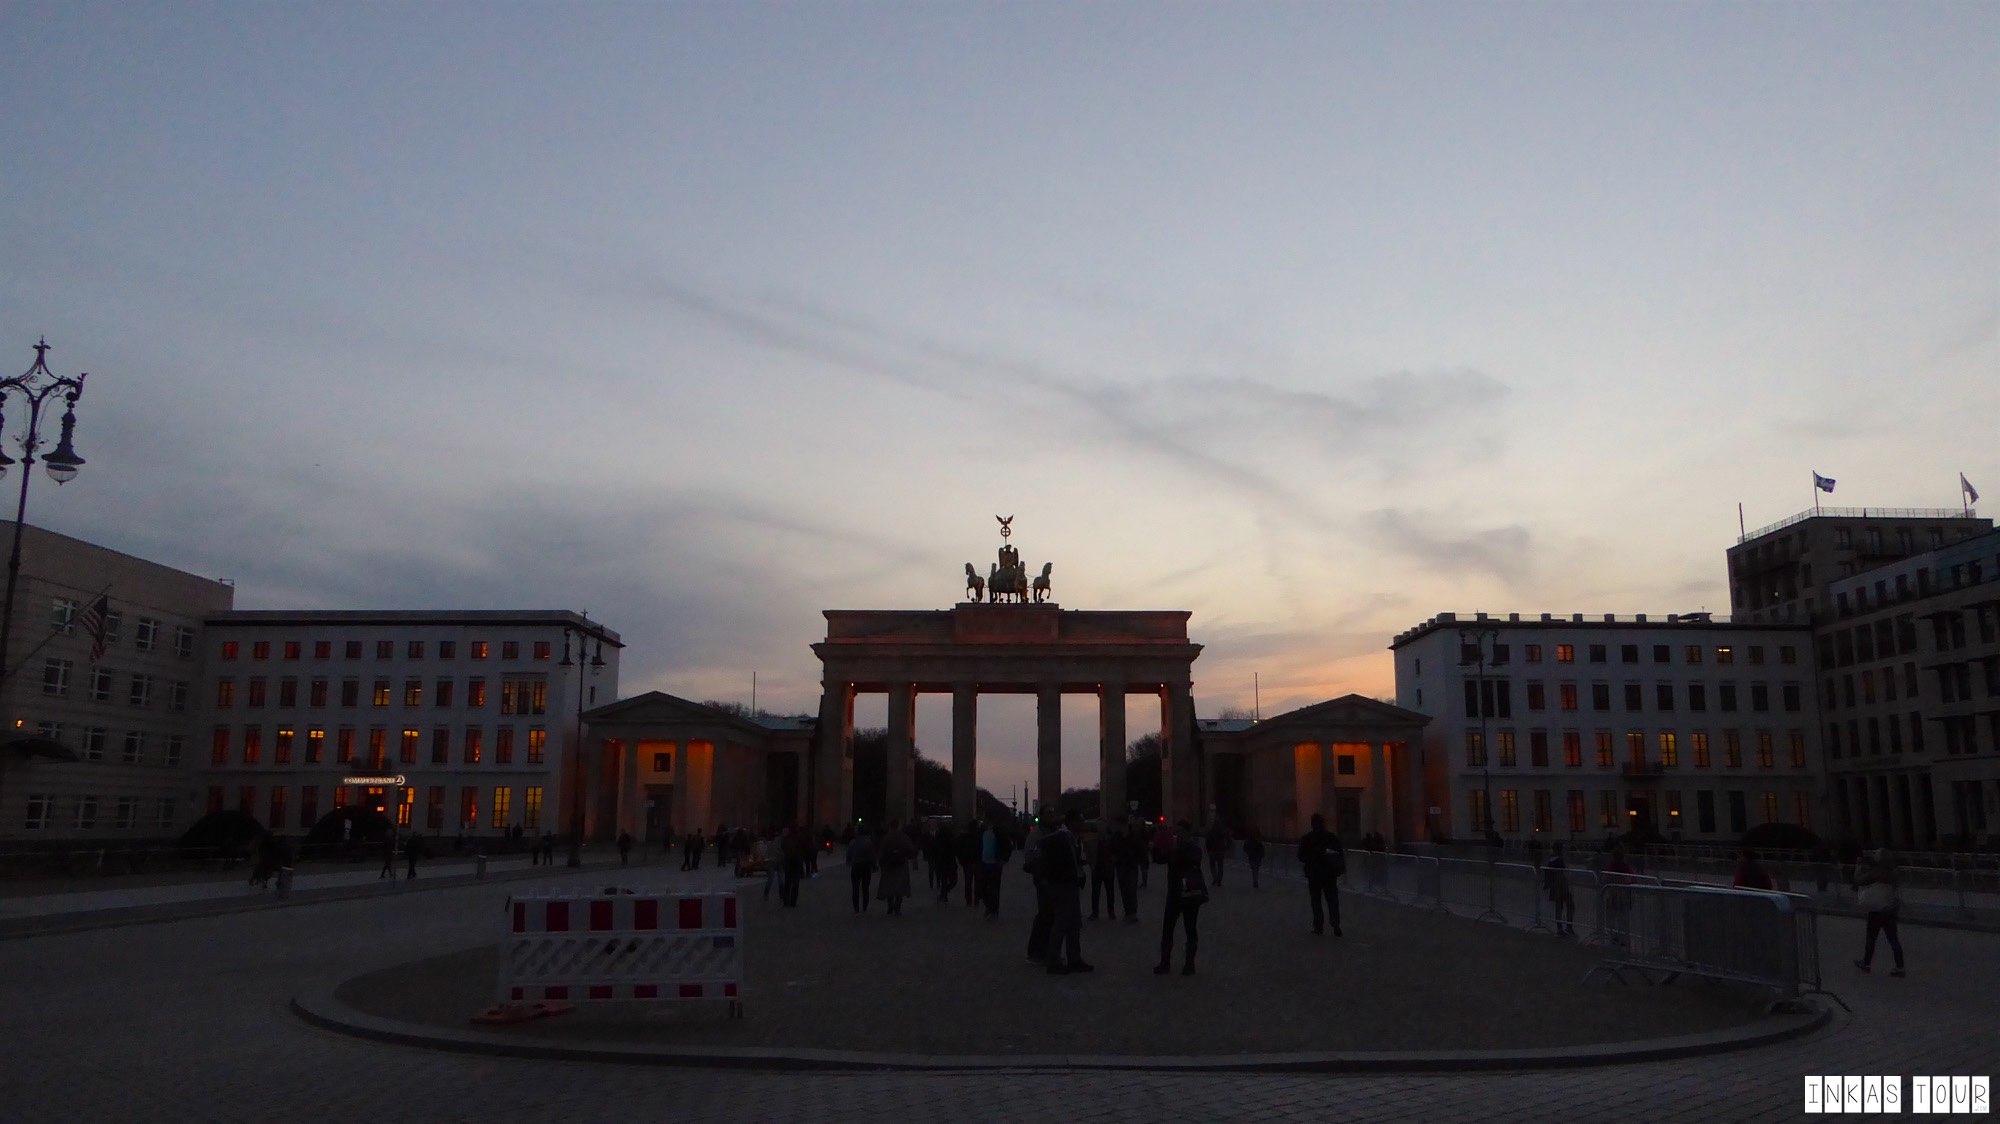 Night Photography in Berlin.